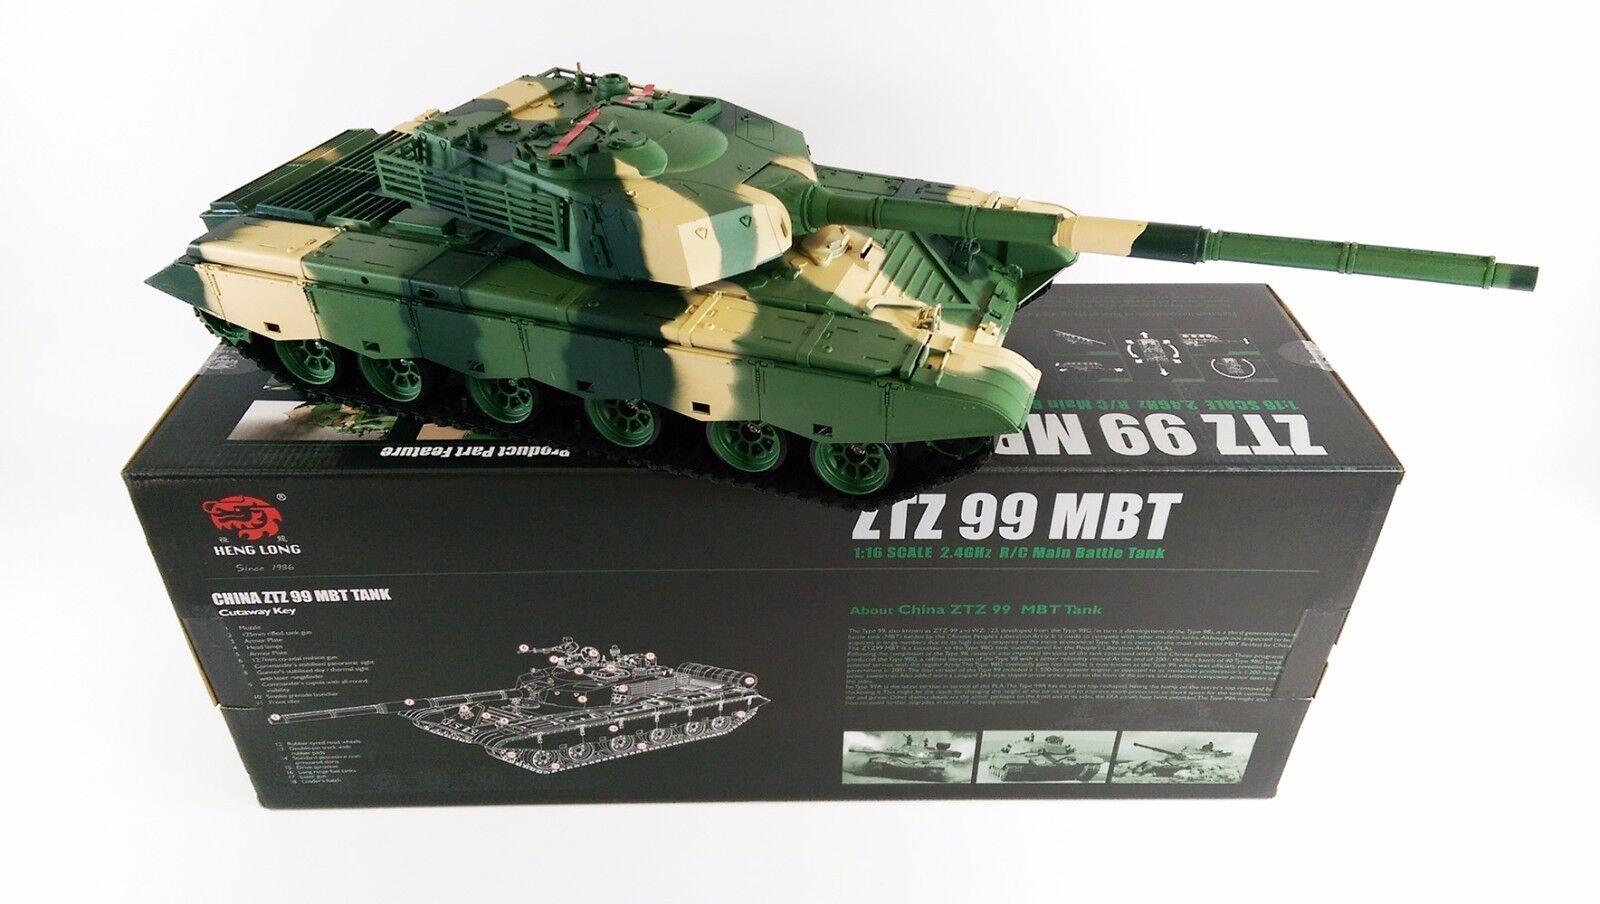 G99 1   16 RTR RC modeloo juguete tanque 2.4 GHz humos acústicos bb 3899 - 1